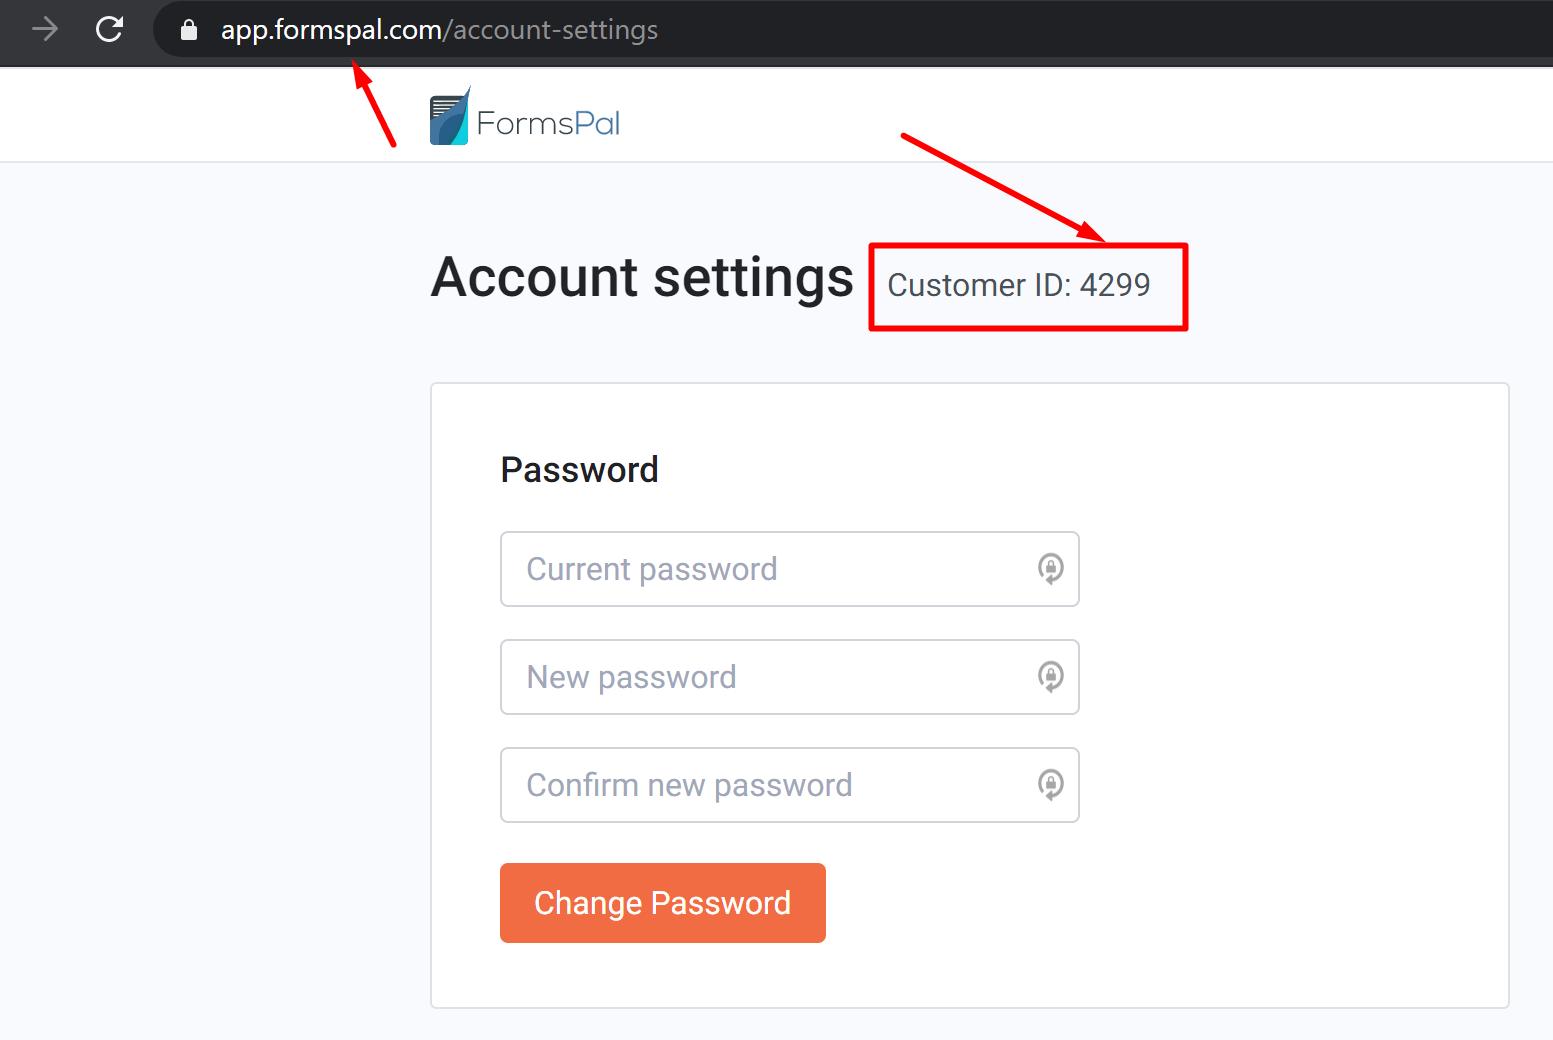 formspal account settings screenshot